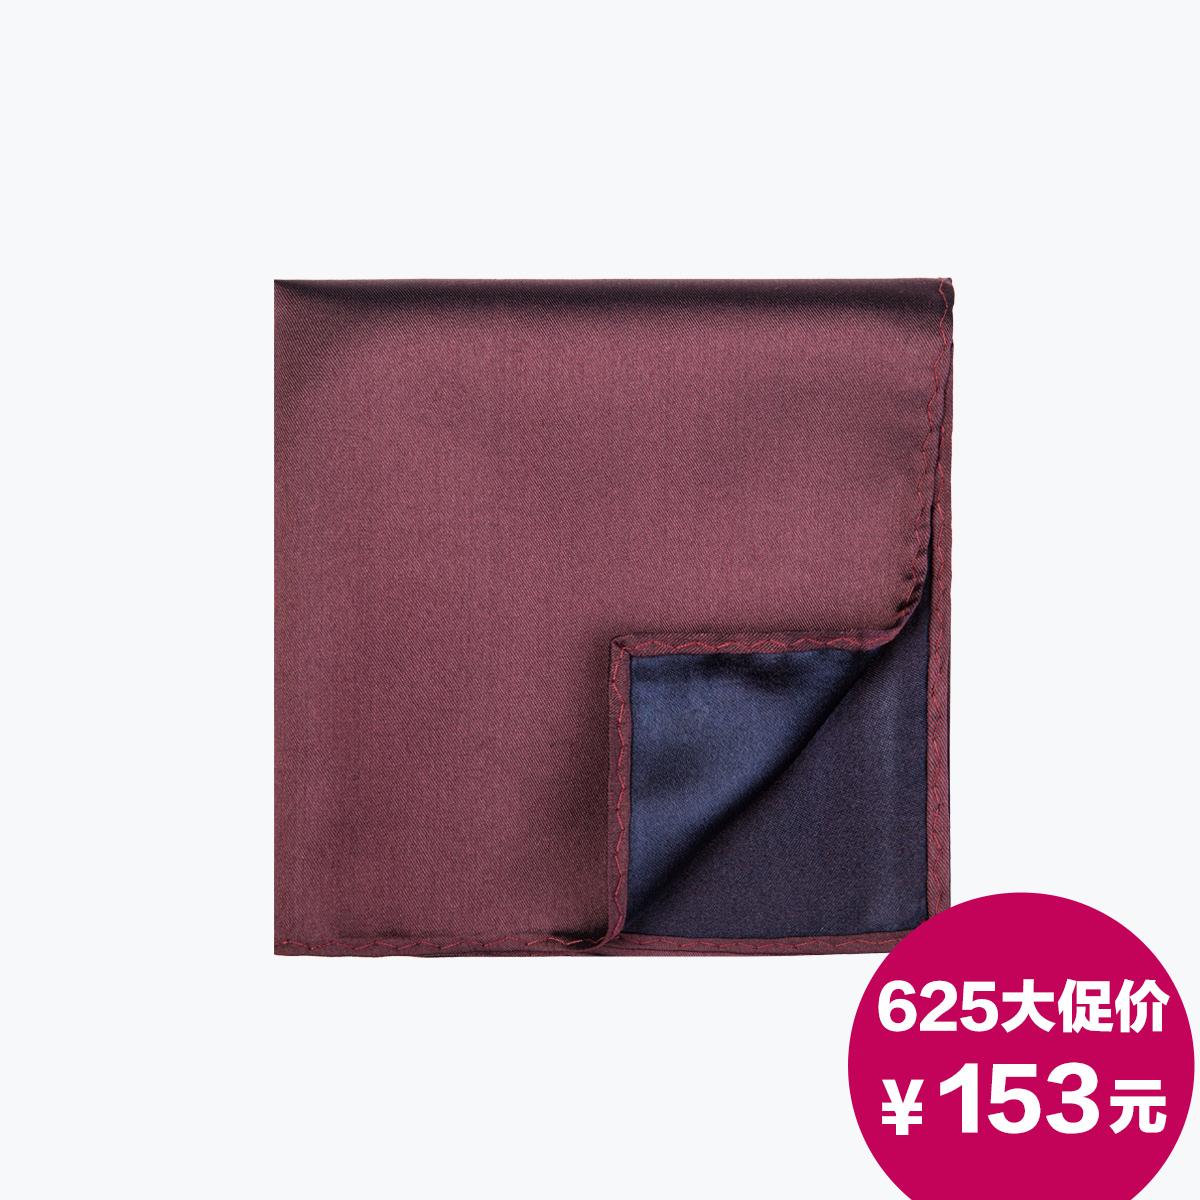 карманный платок By creations FJ/511/04 ByCreations Lite 100% three creations 200pcs 7x5cm